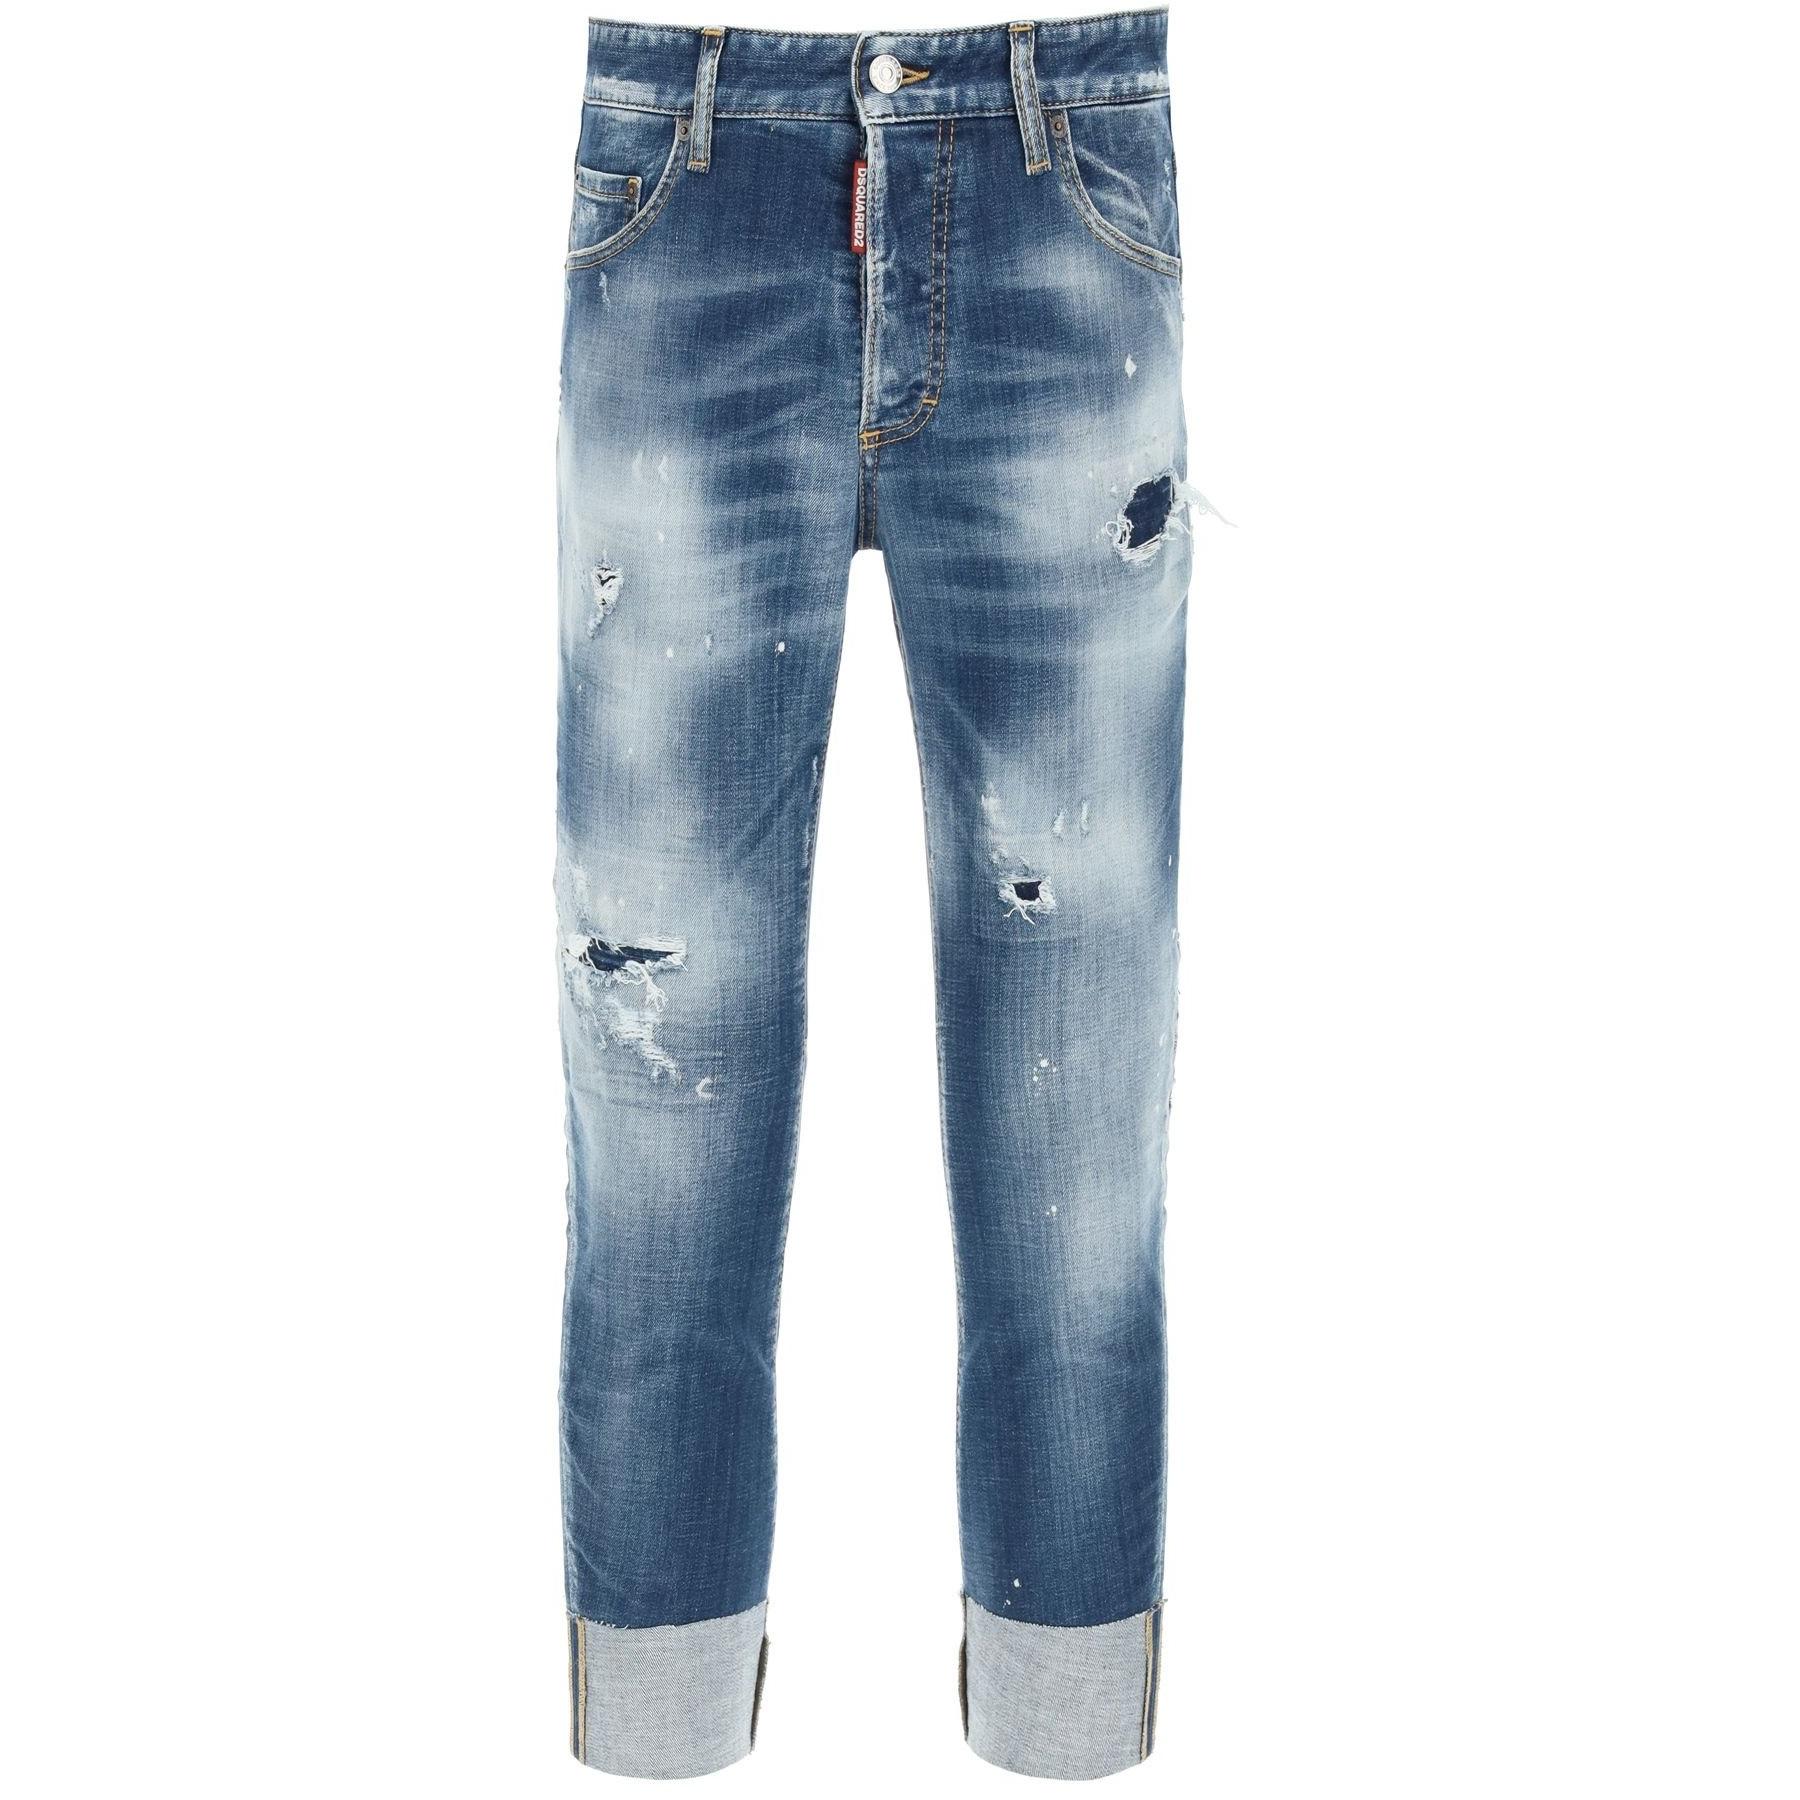 Dsquared2 男士 Sailor FIt牛仔裤低腰修身 正品代购 S74LB0955